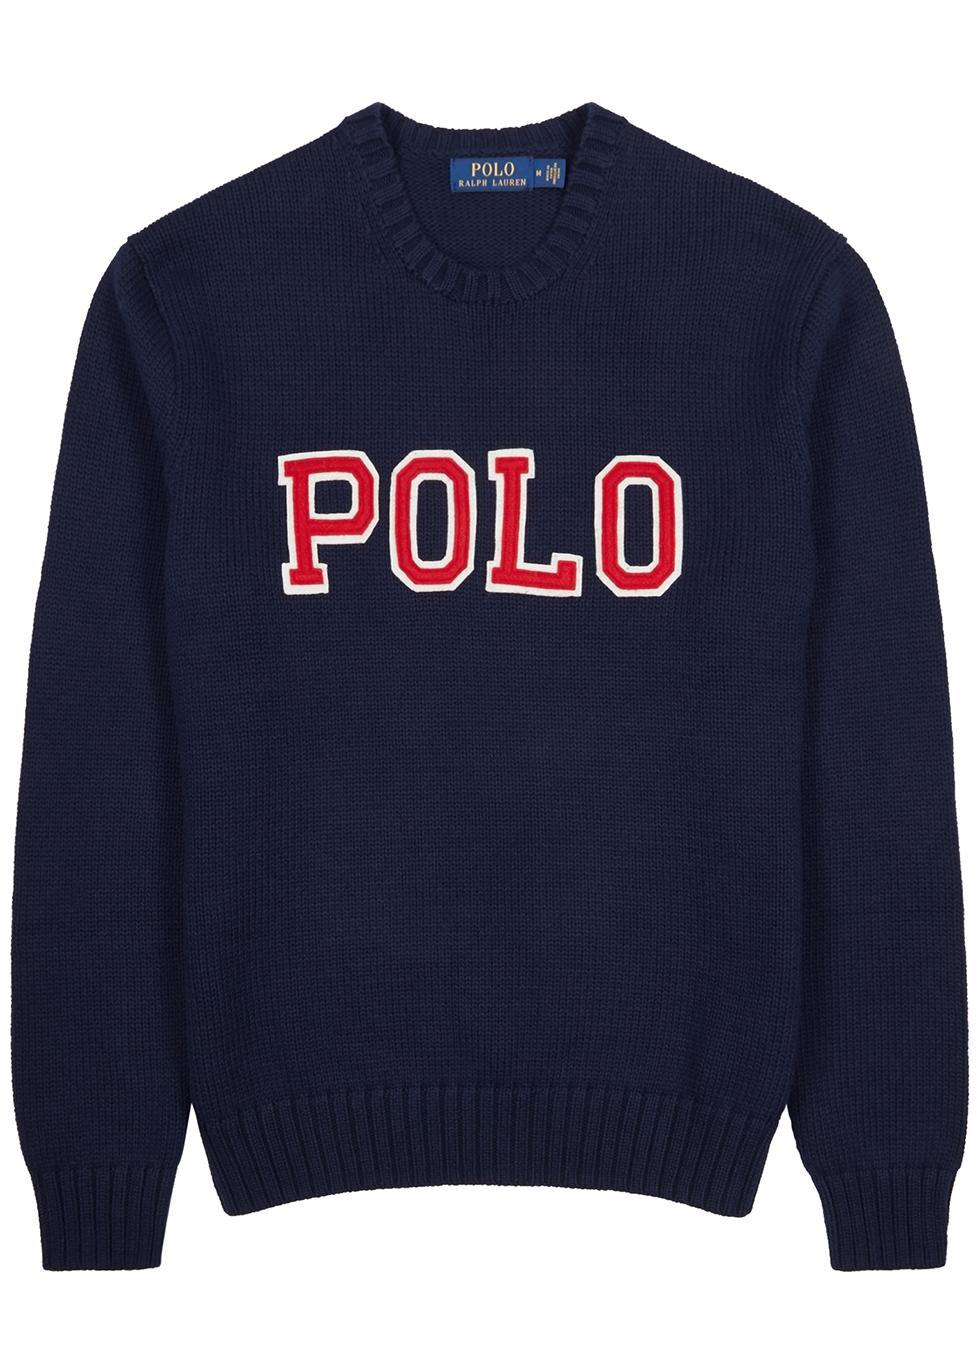 1a444b2311da ... france polo ralph lauren polo shirts t shirts jumpers harvey nichols  b39a2 b1292